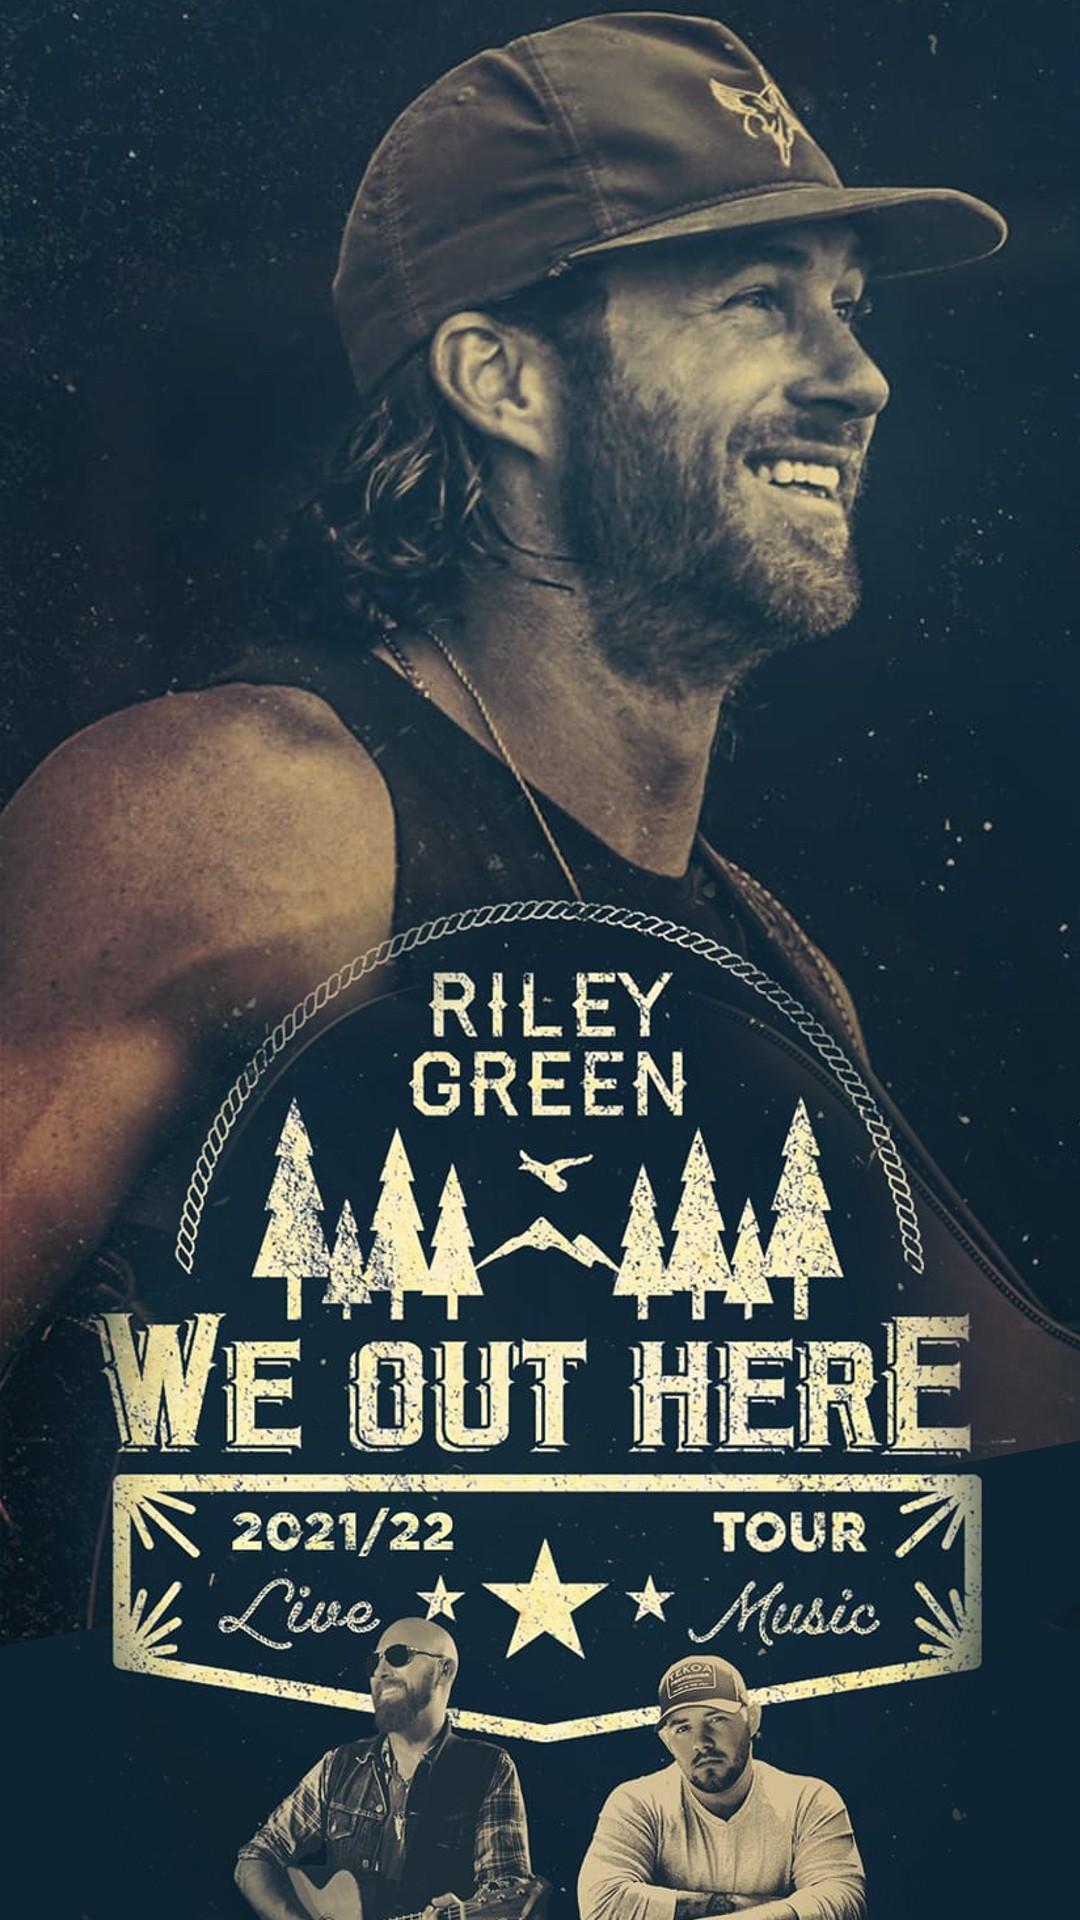 February 5th, Riley Green